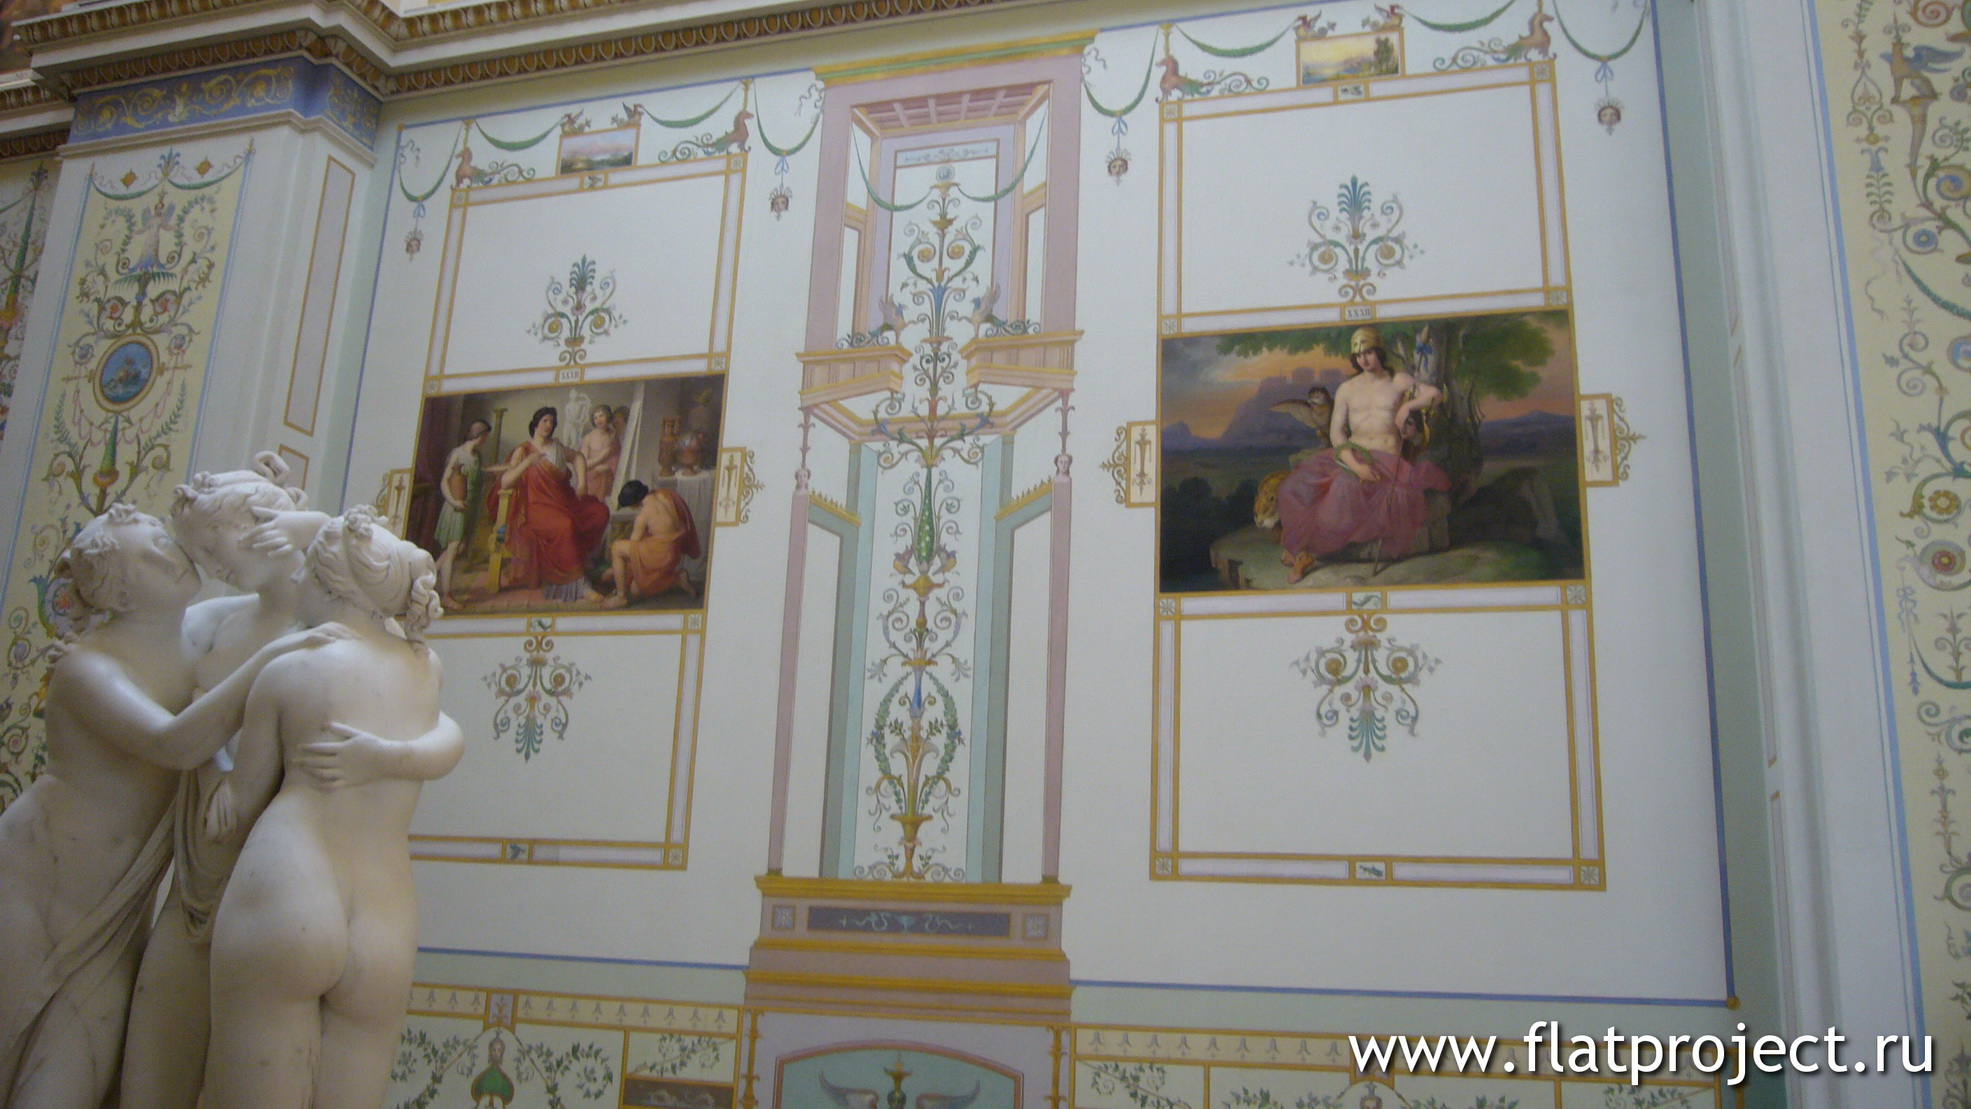 The State Hermitage museum interiors – photo 235